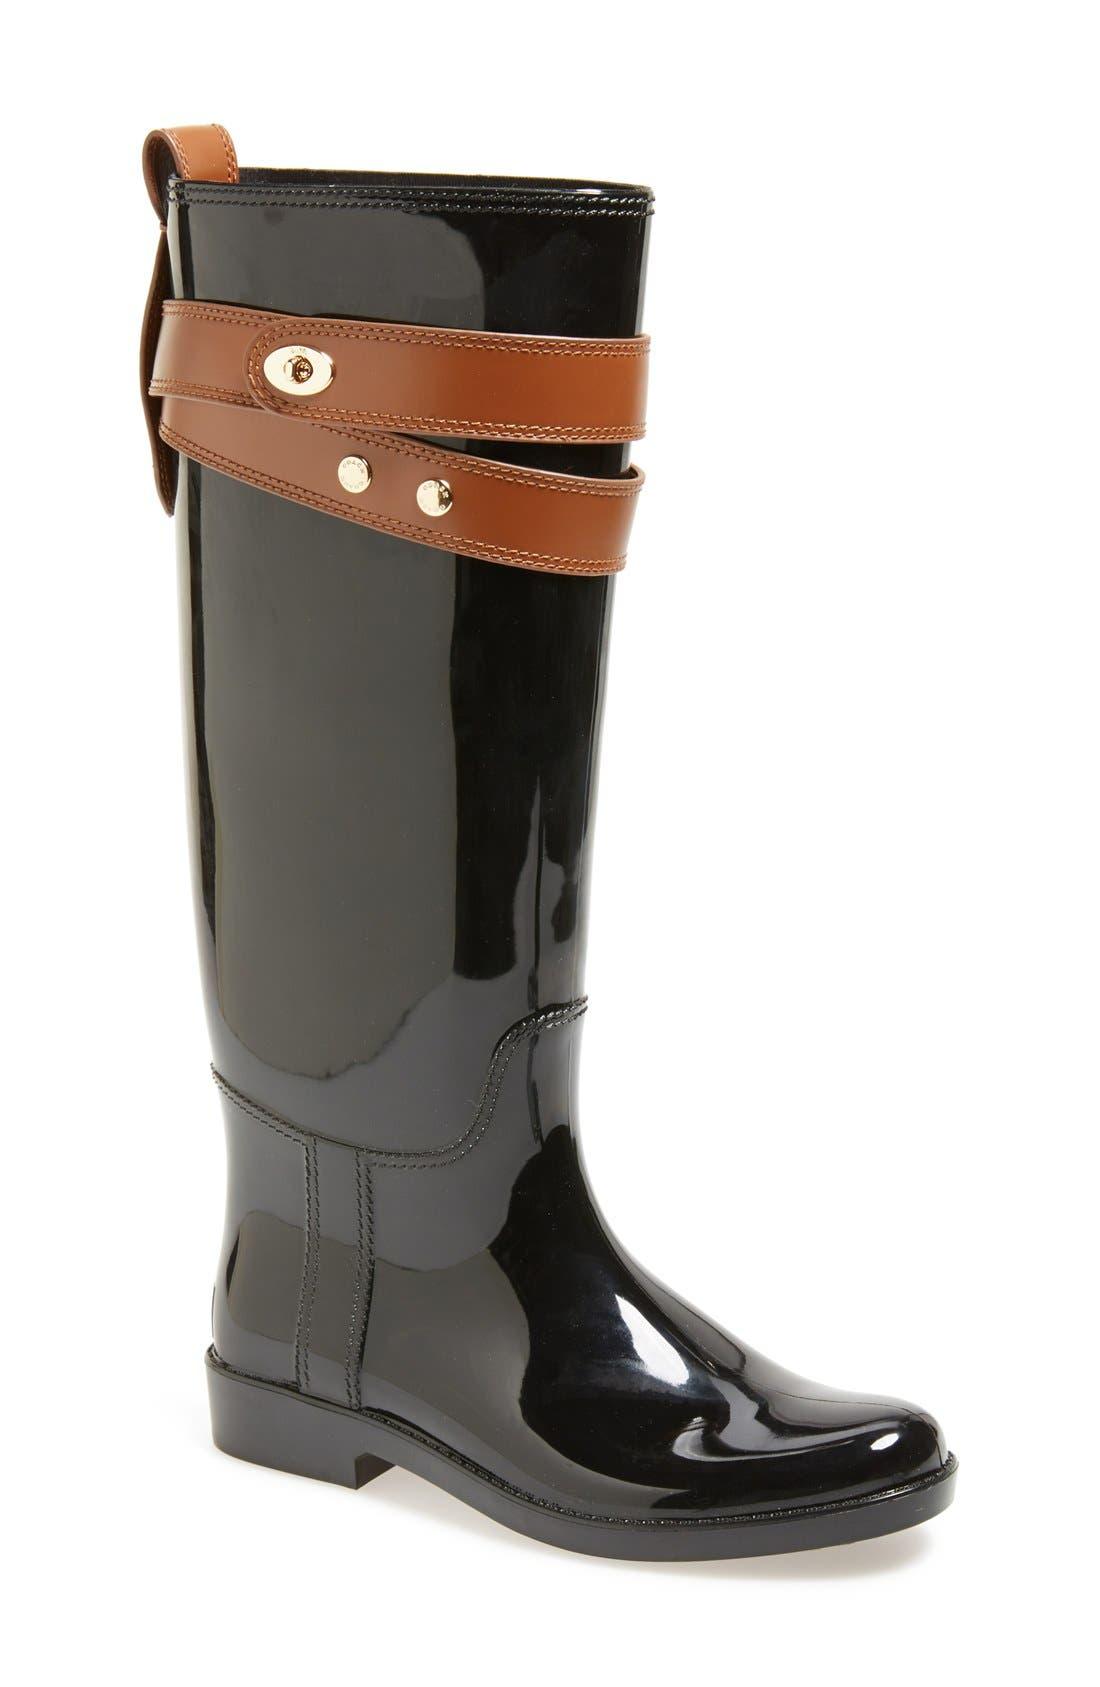 Alternate Image 1 Selected - COACH 'Talia' Waterproof Rain Boot (Women)